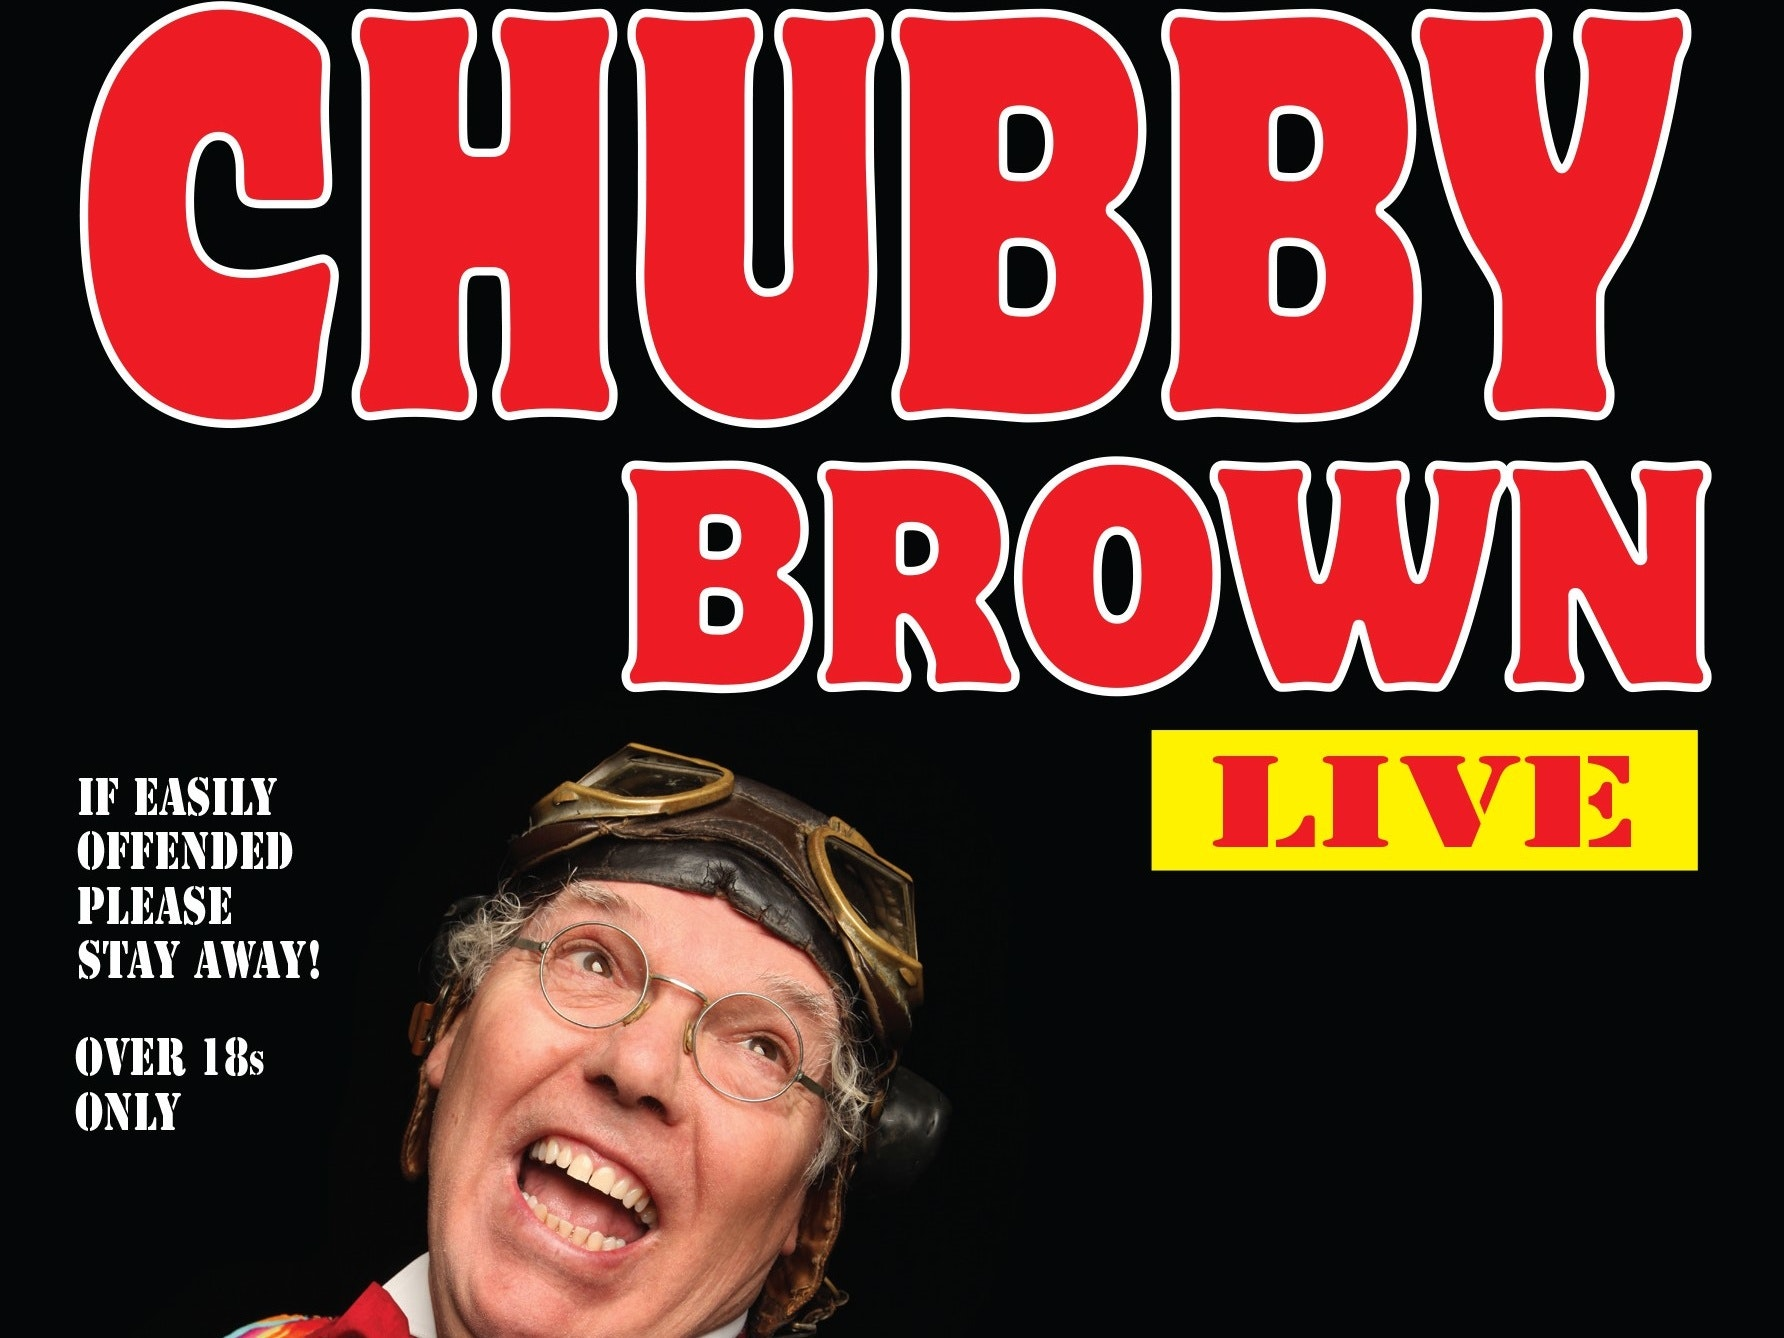 Chubby brown tour